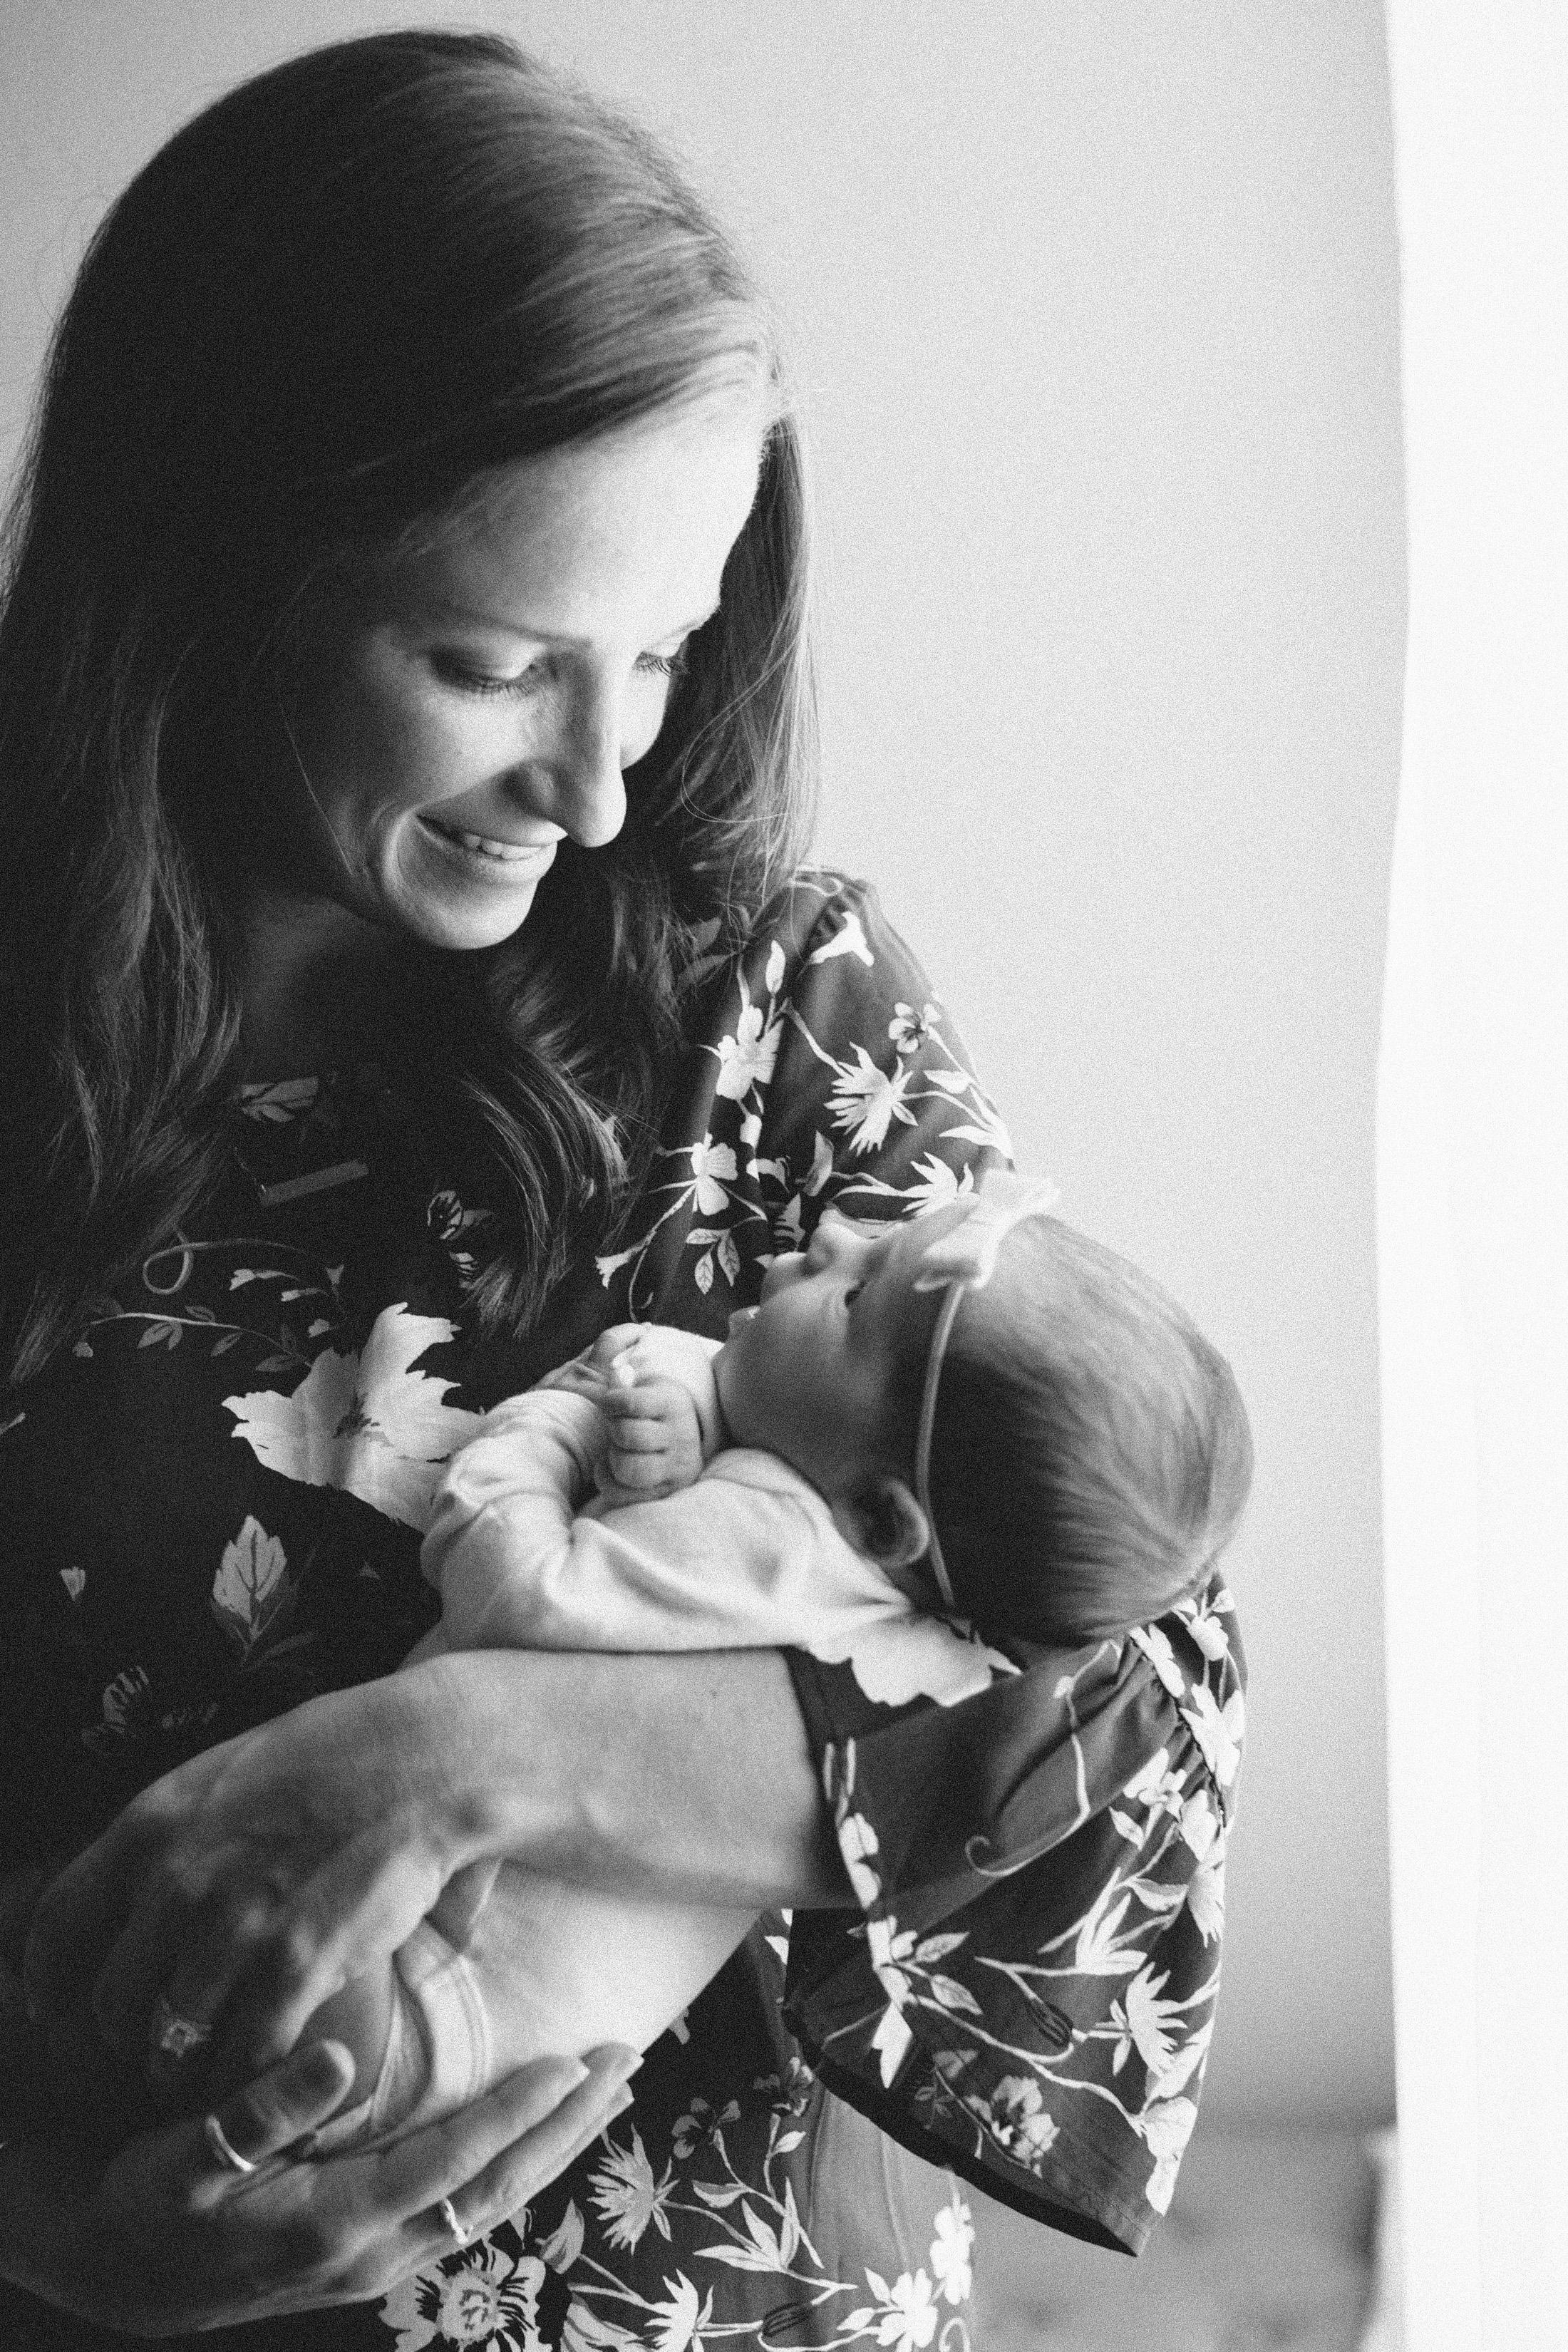 NewbornValerie2017-1-7.jpg